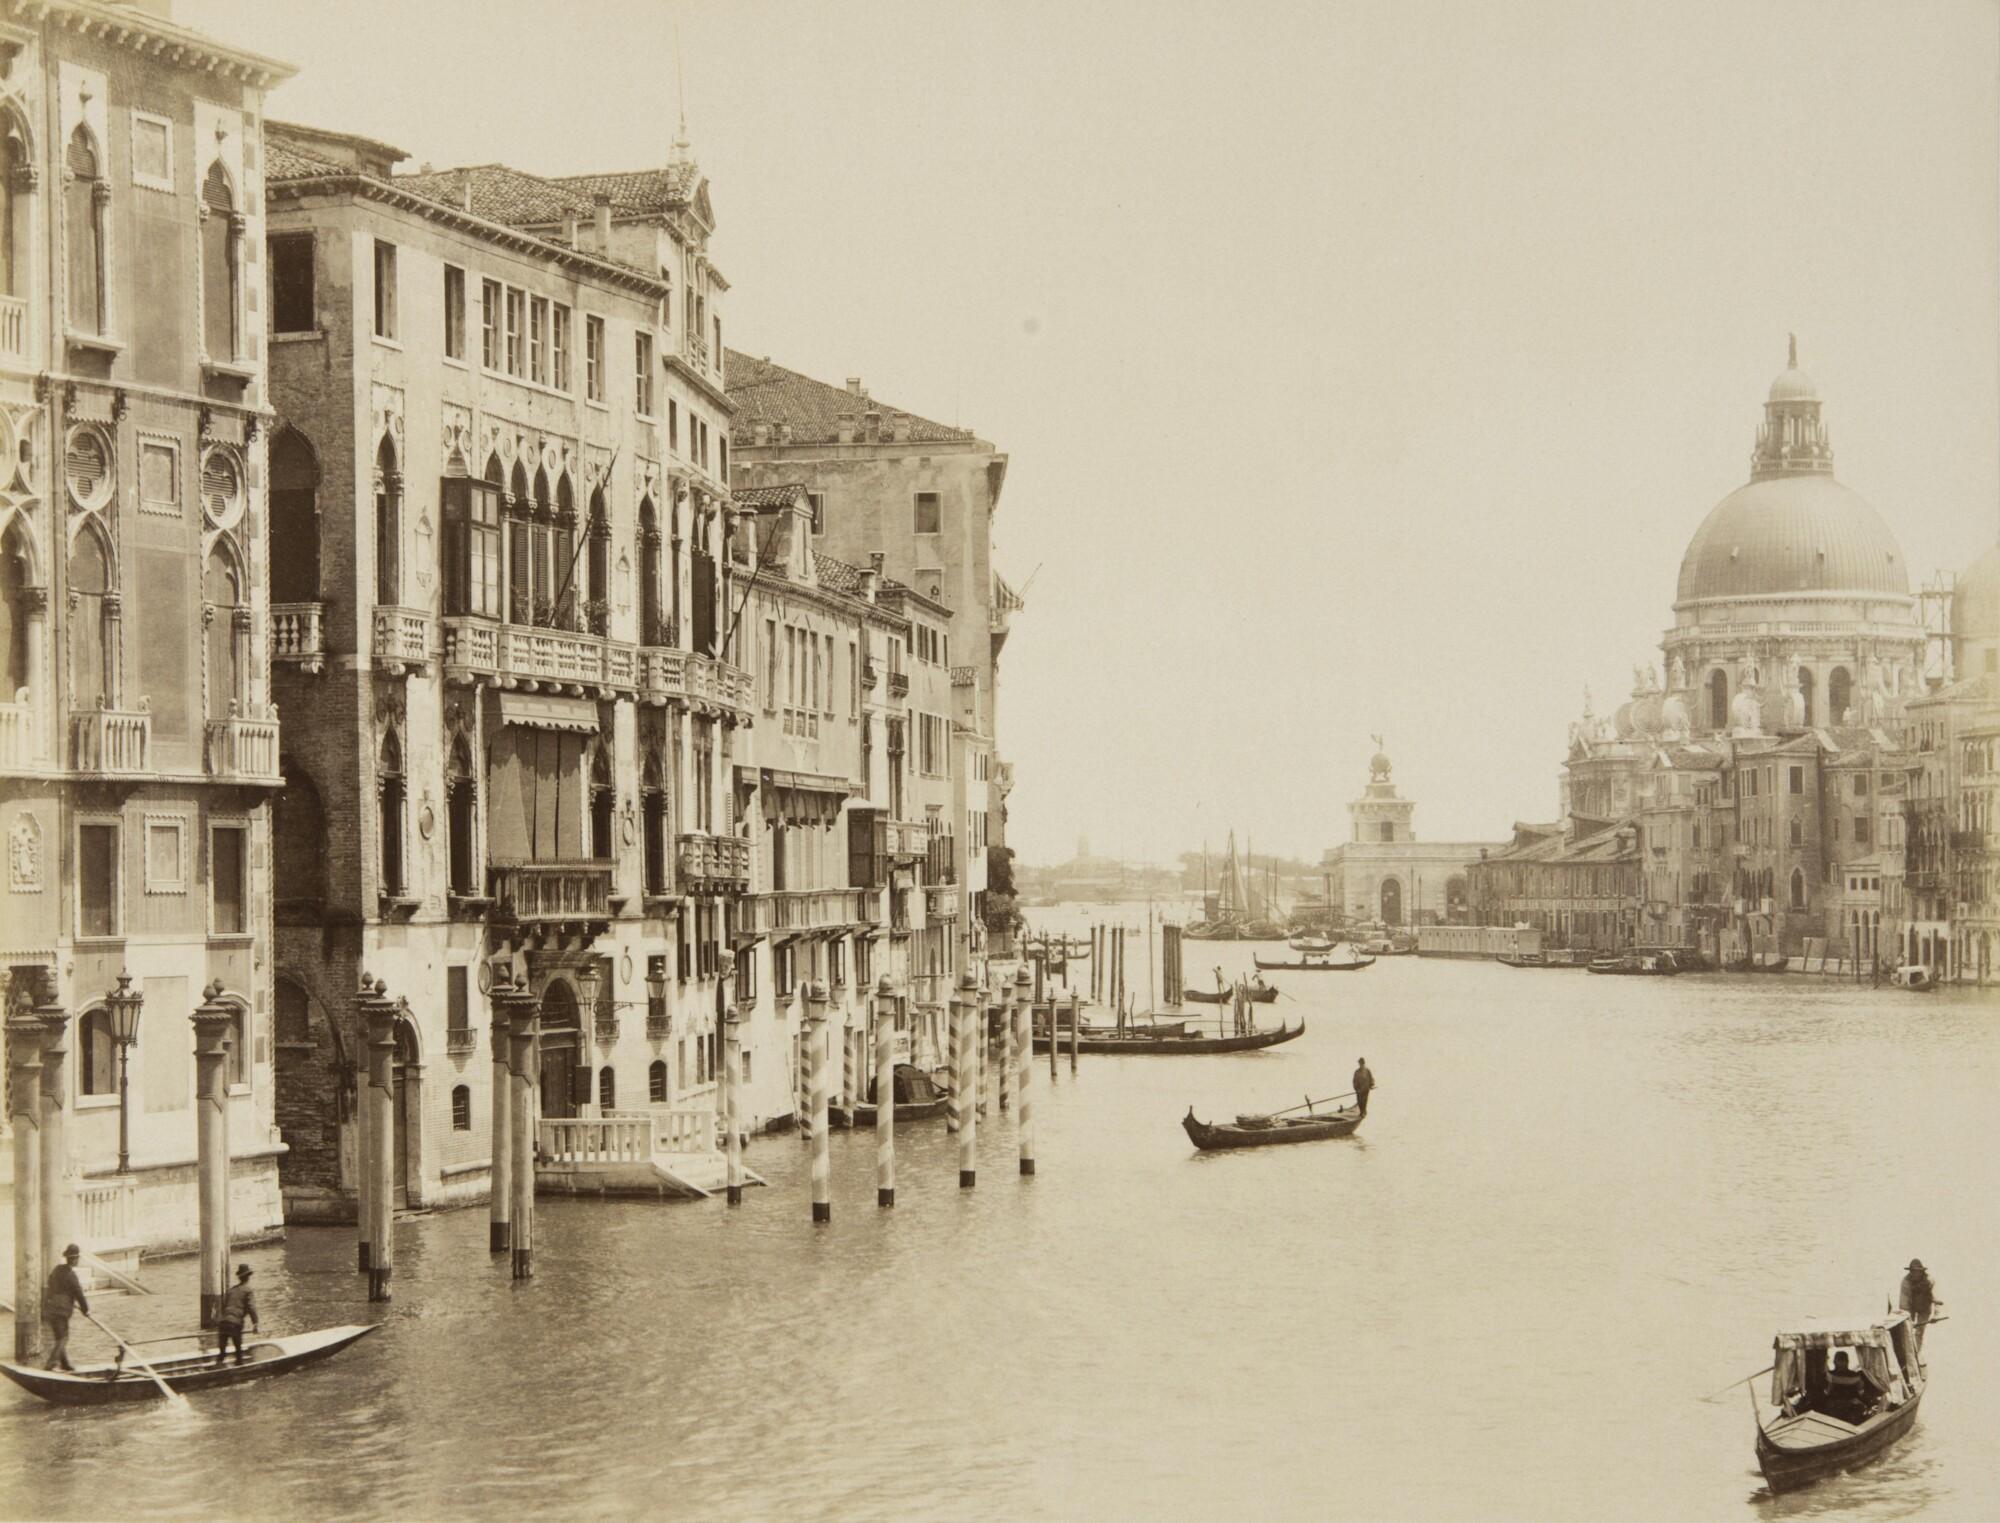 Алинари.    Вид на город с Гранд-канала, 1900‑е   Альбуминовый отпечаток